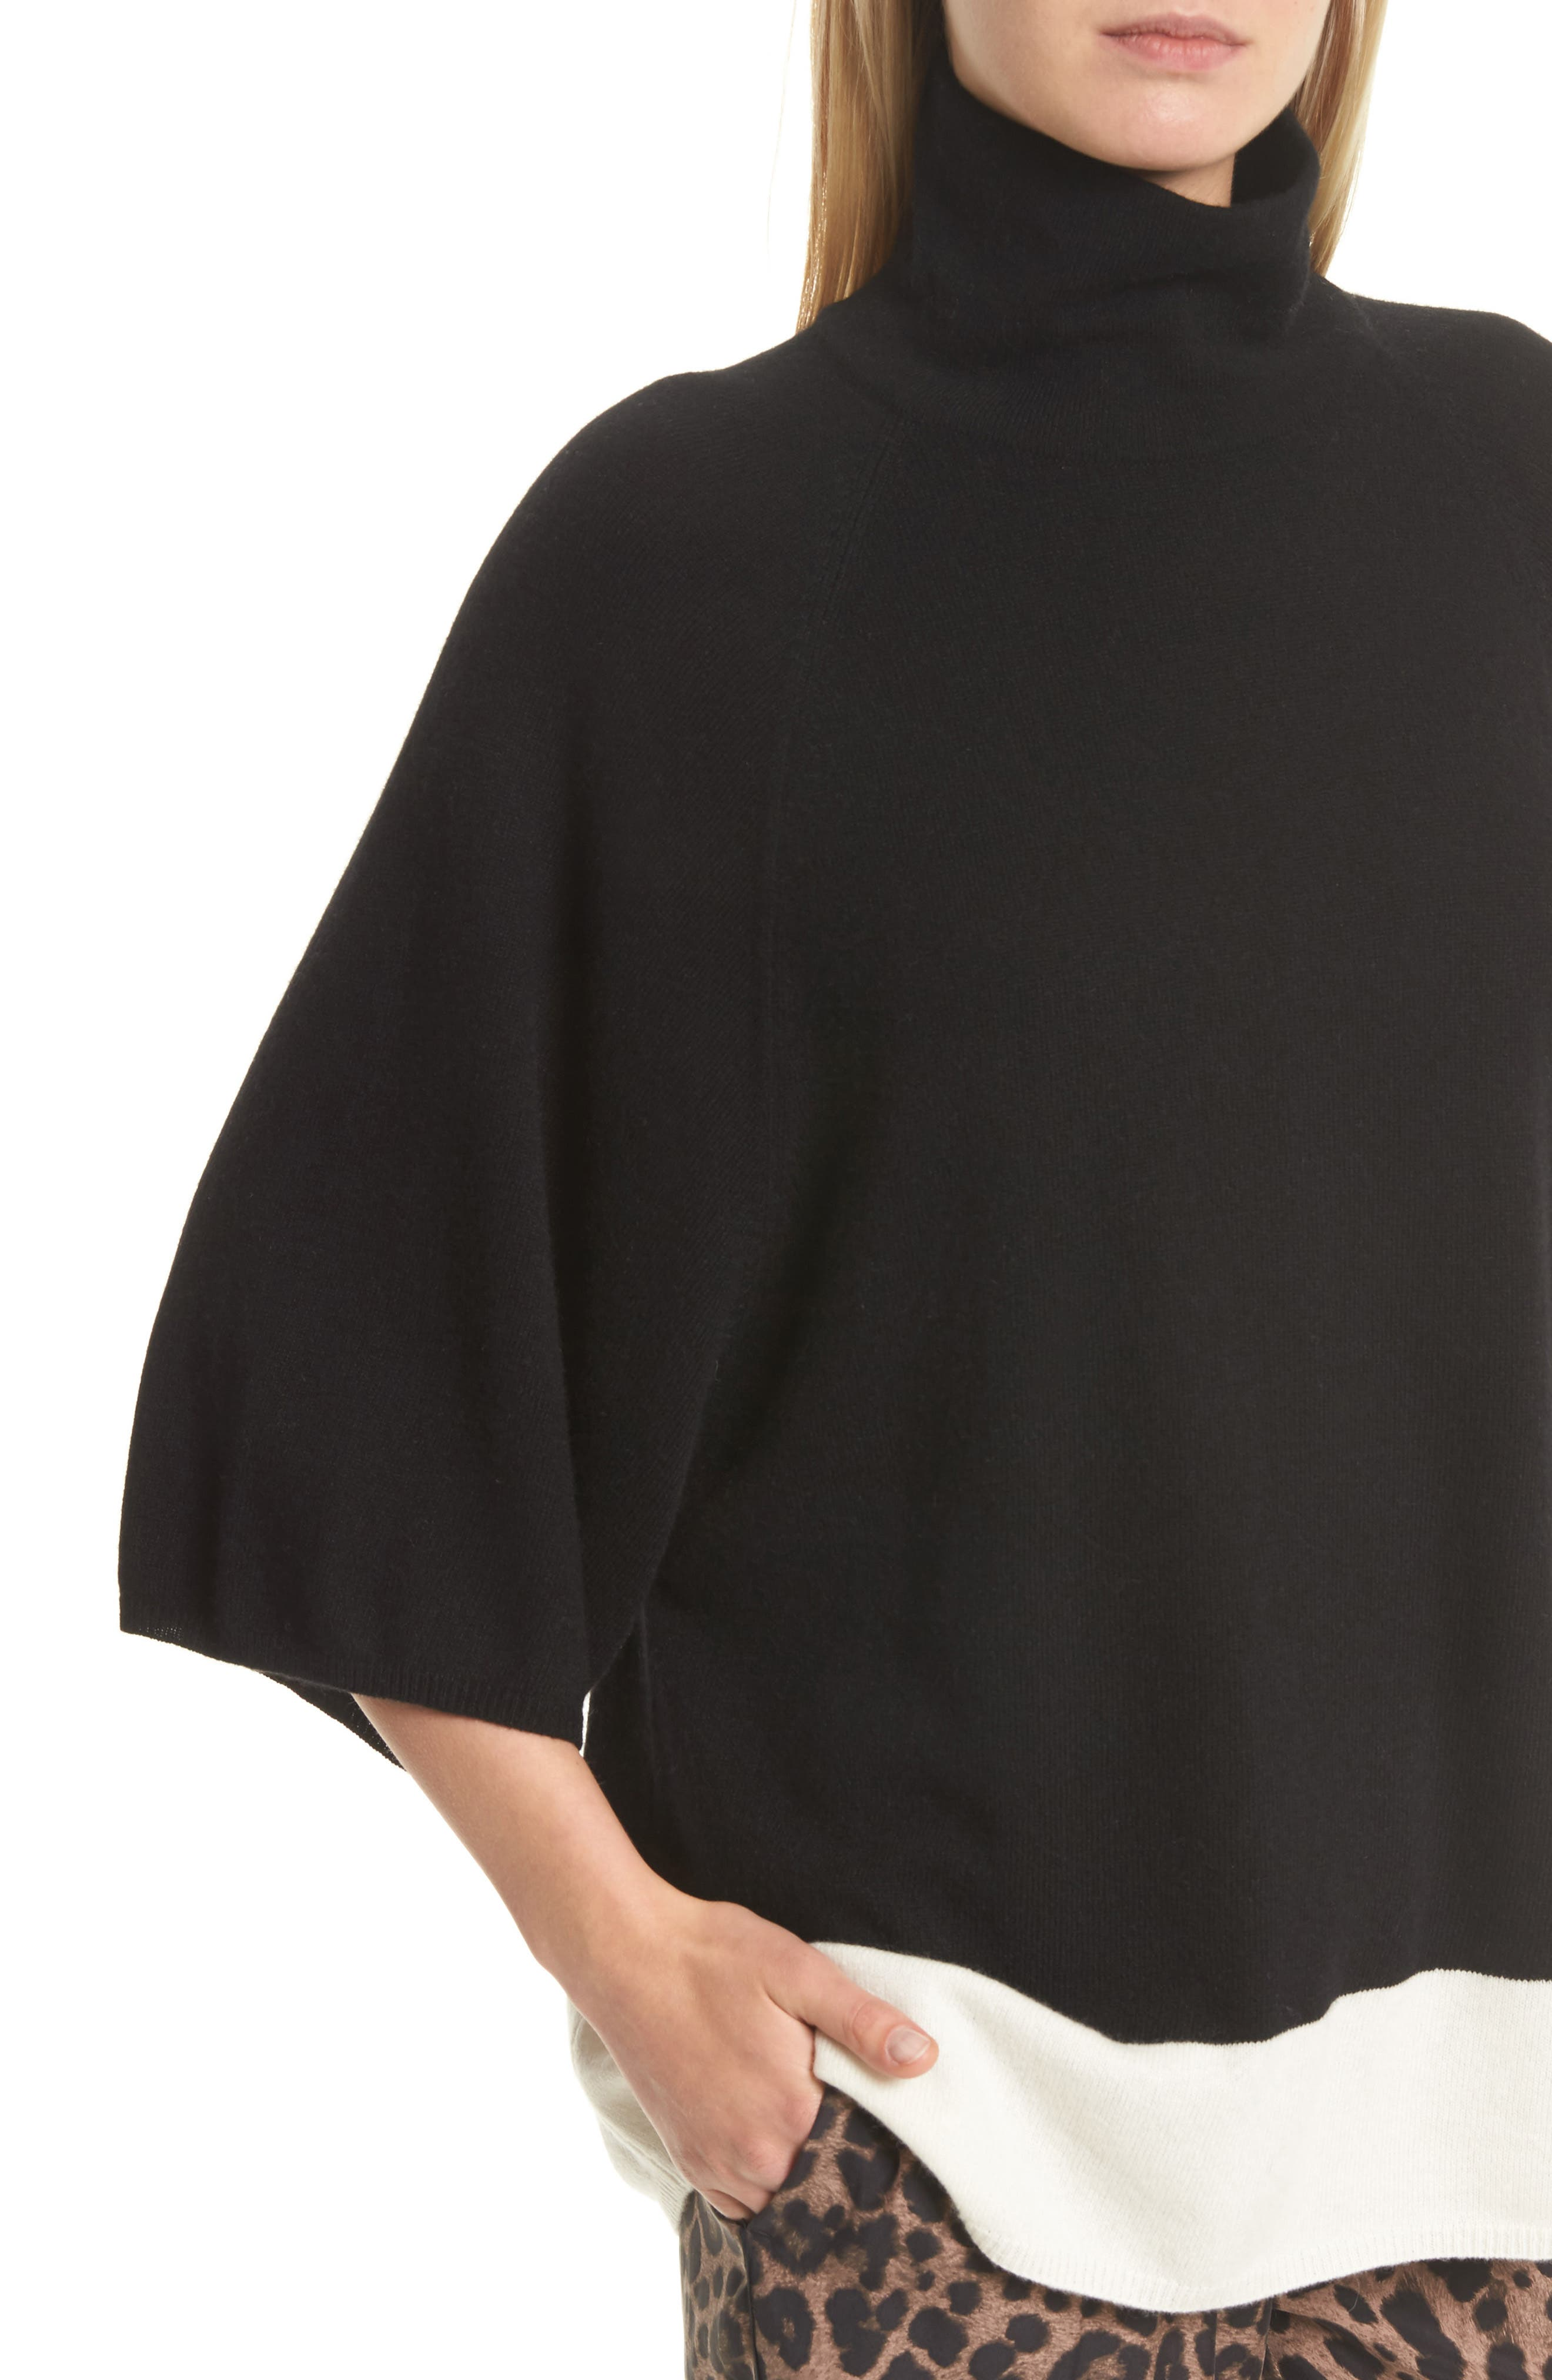 Celia G Wool & Cashmere Sweater,                             Alternate thumbnail 4, color,                             004